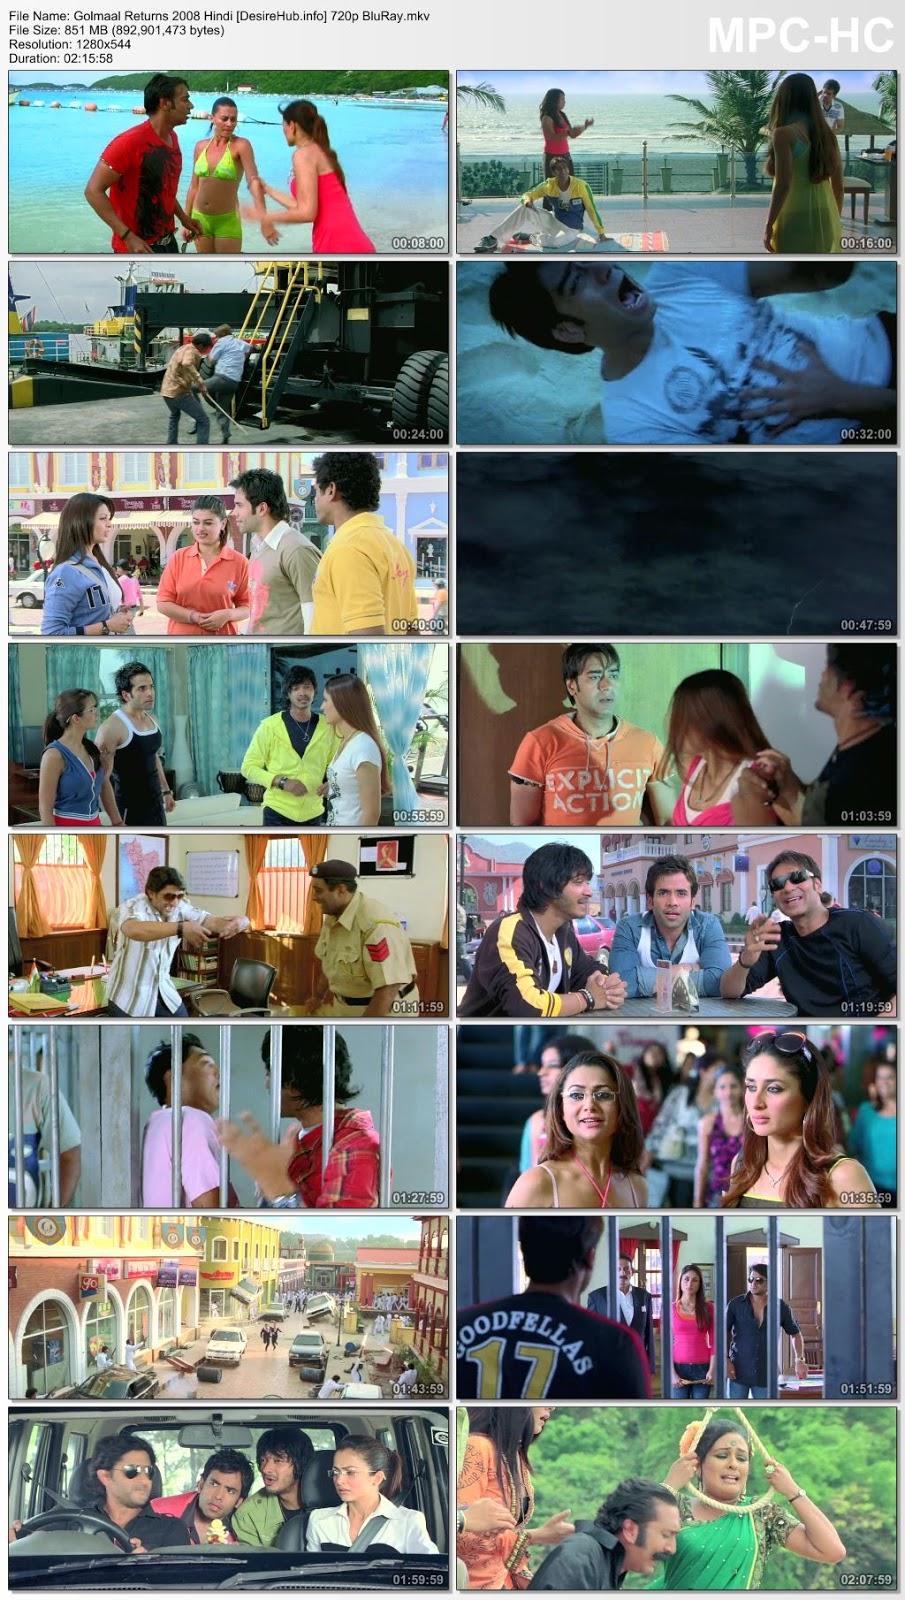 Golmaal Returns 2008 Hindi 720p BluRay 850MB Desirehub